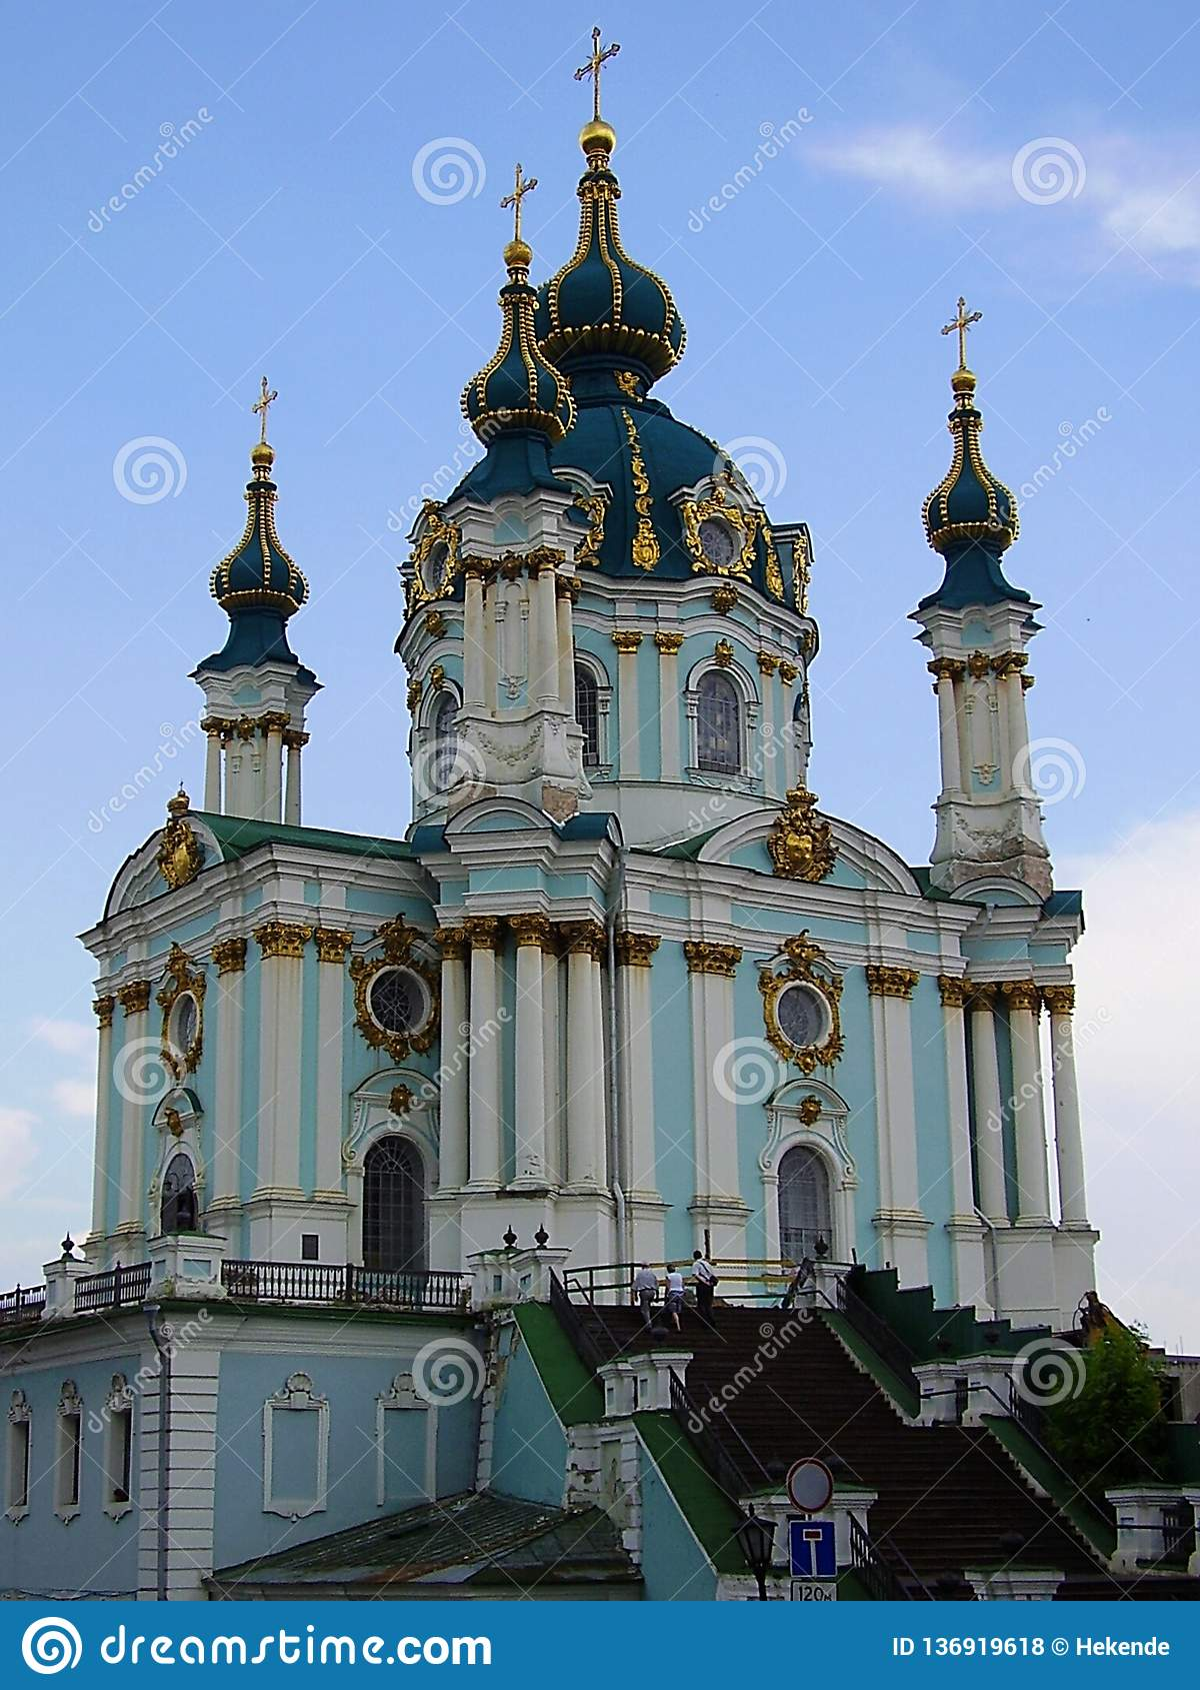 Ukraine, Kiew, 2010, Andrews Church, goldene Hauben, Geschichte, Dnipro-Flüsse